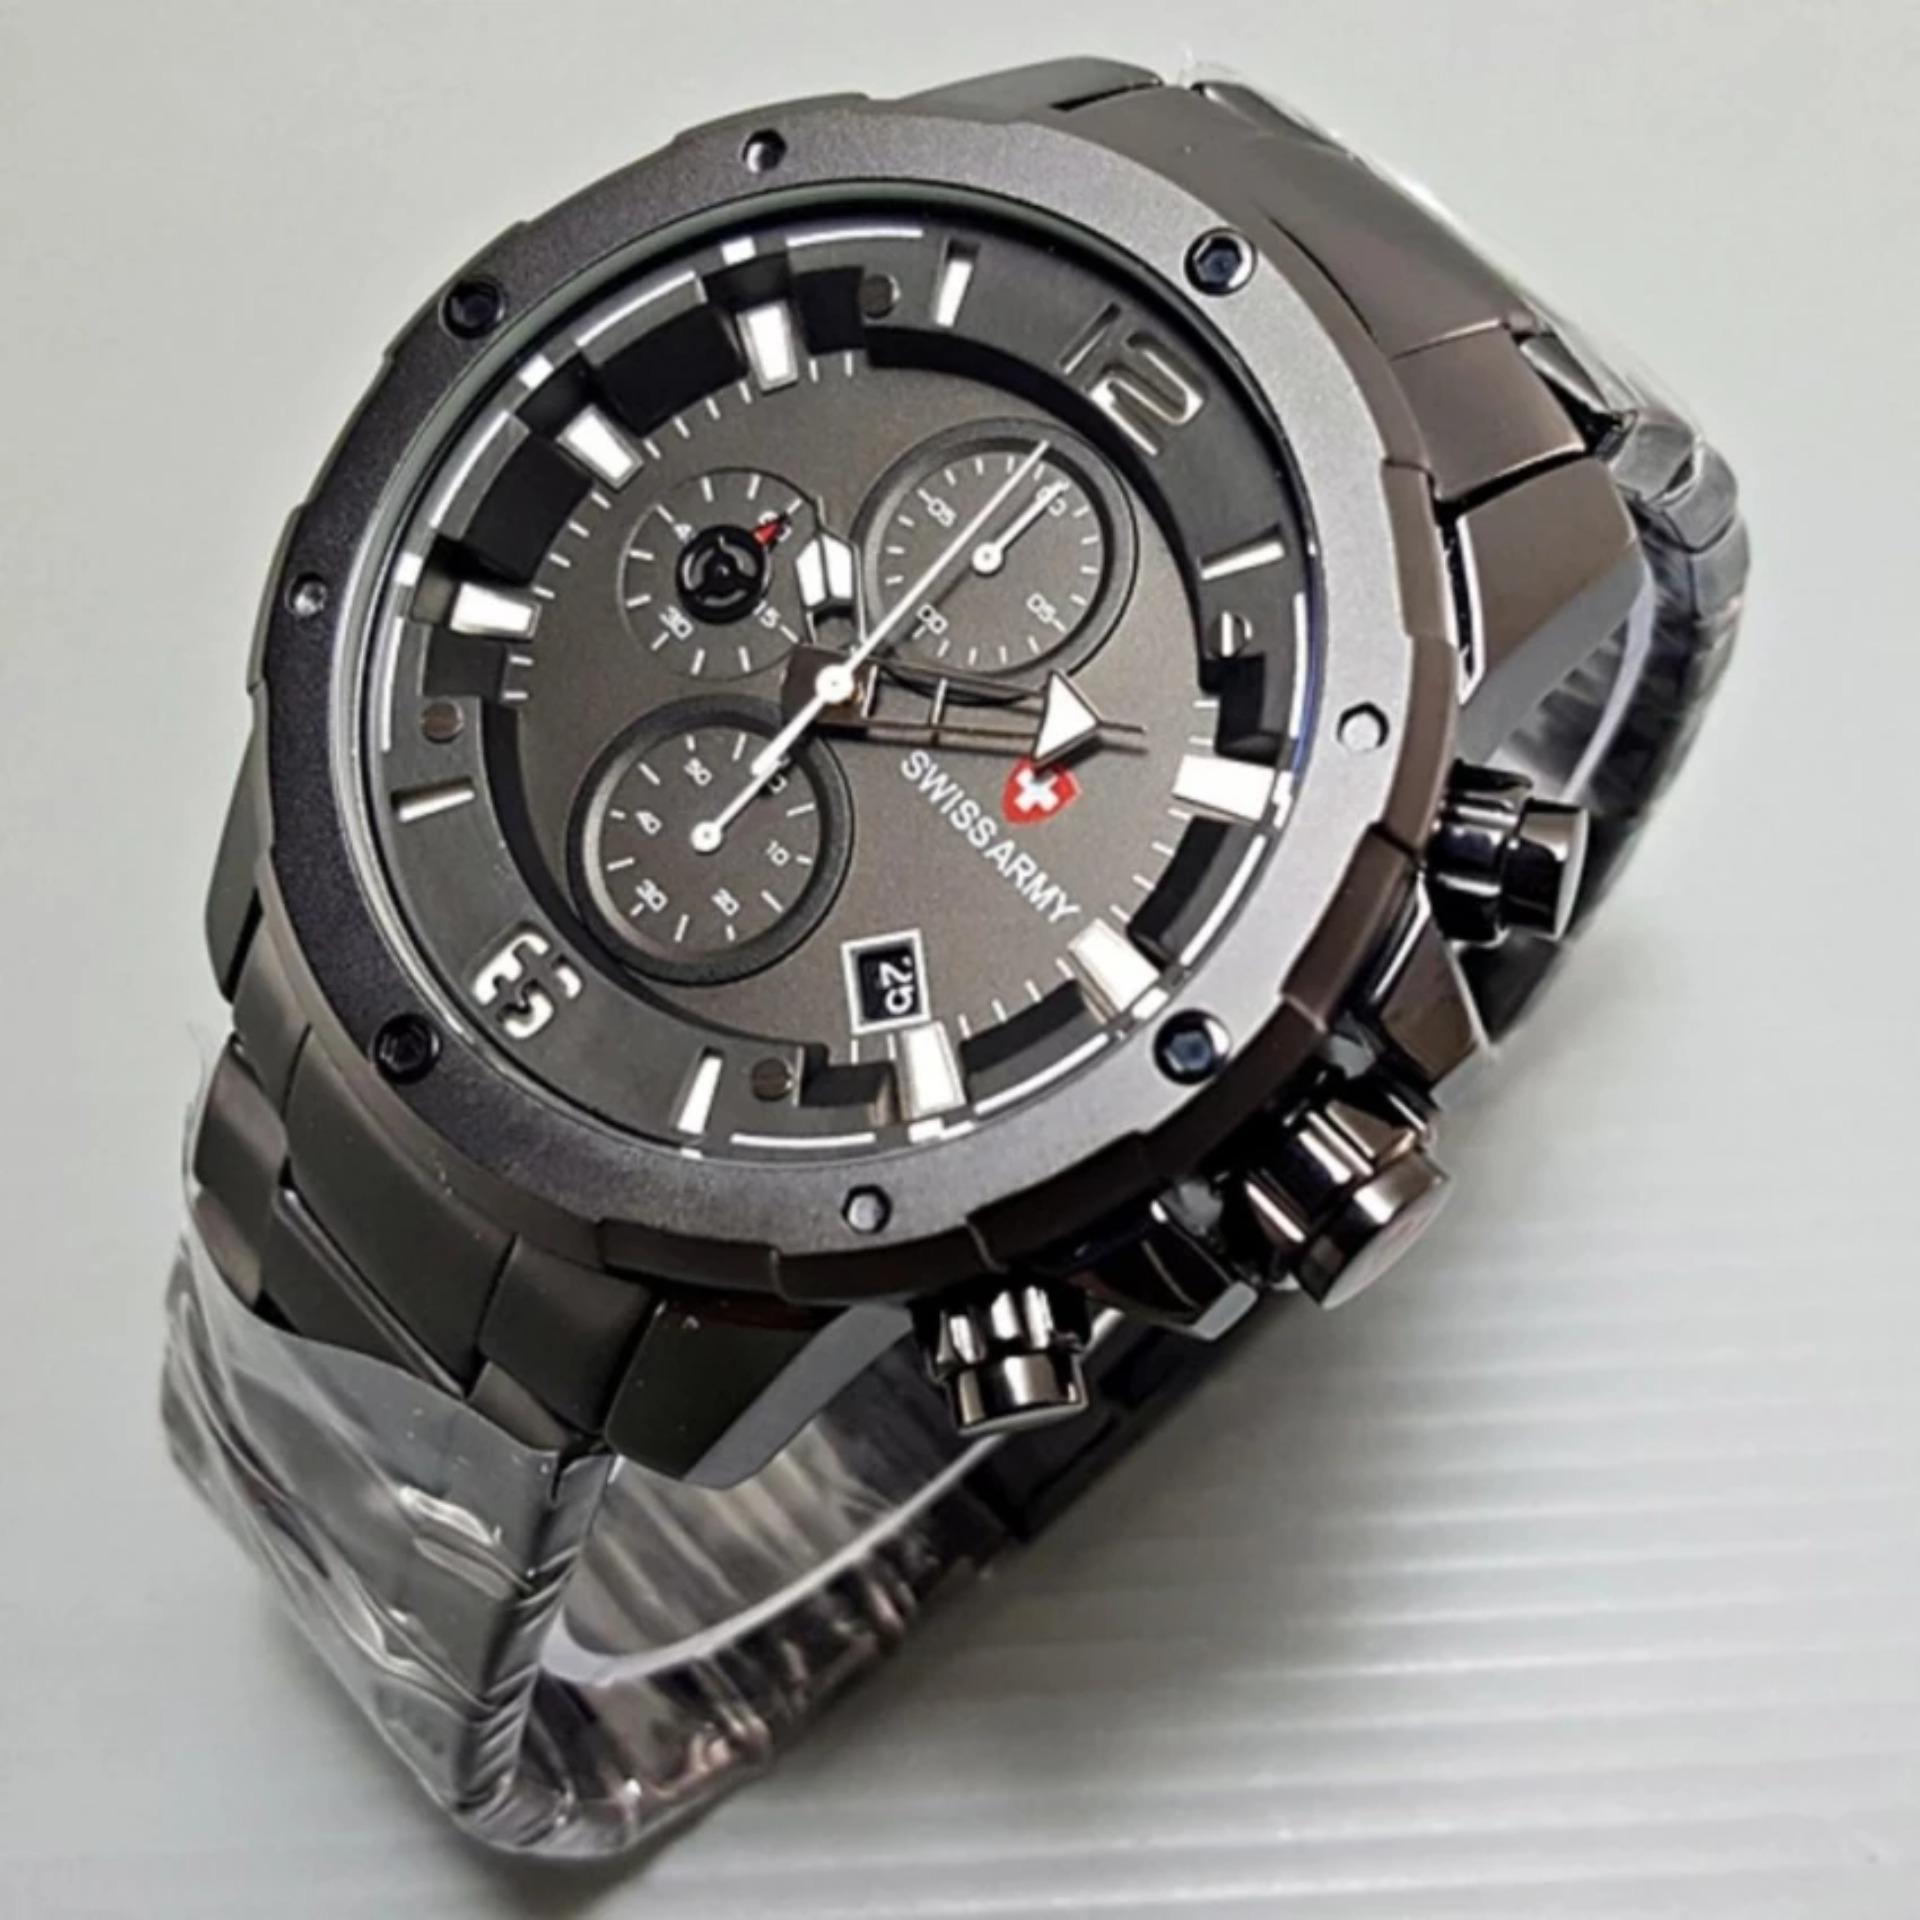 SWISS ARMY jam tangan pria terbaru original chrono aktif stenleesteel black SA 7283 ART